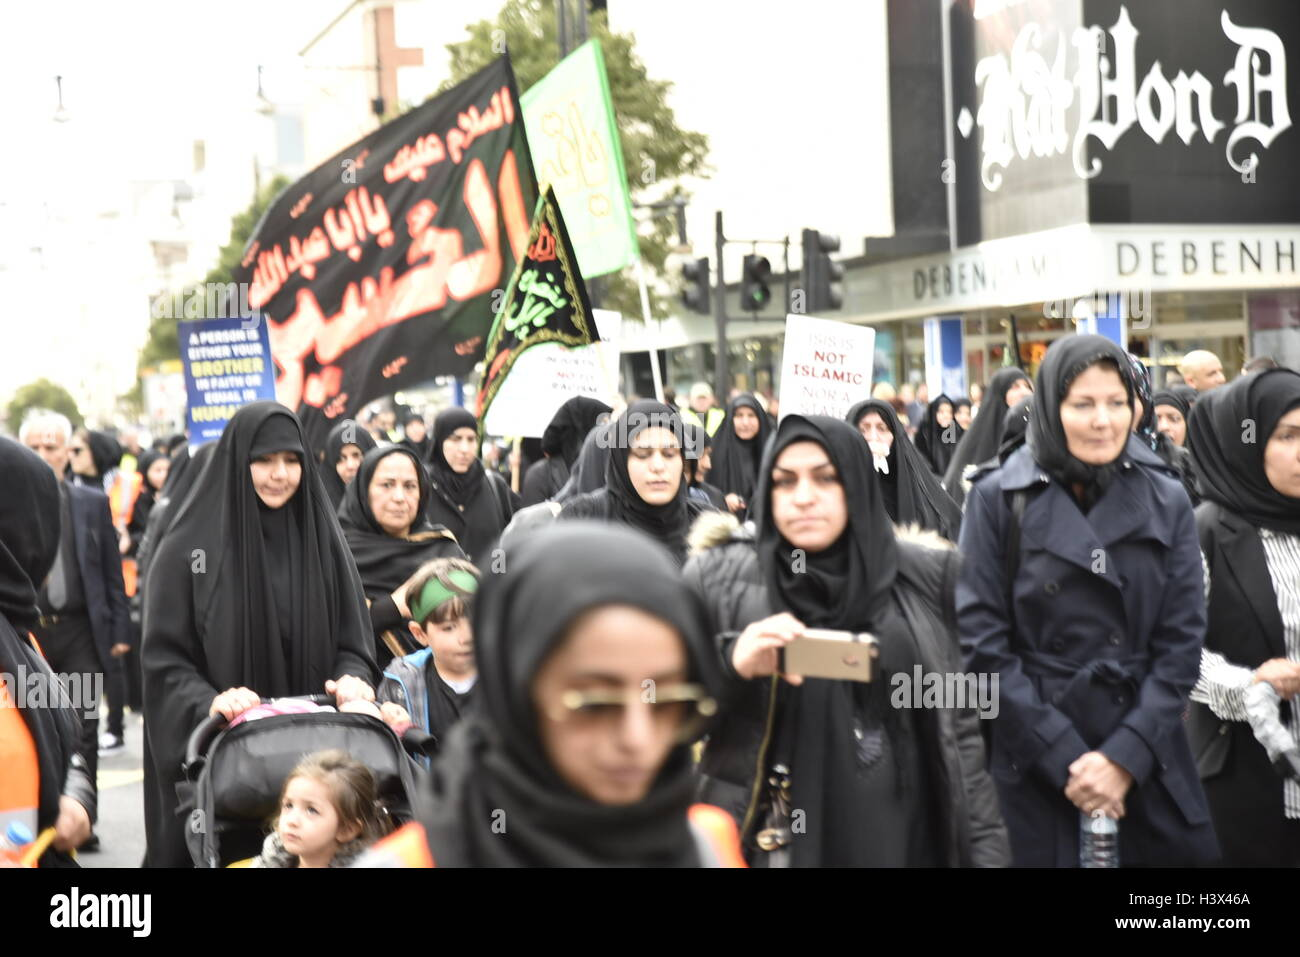 muslims in london 2016